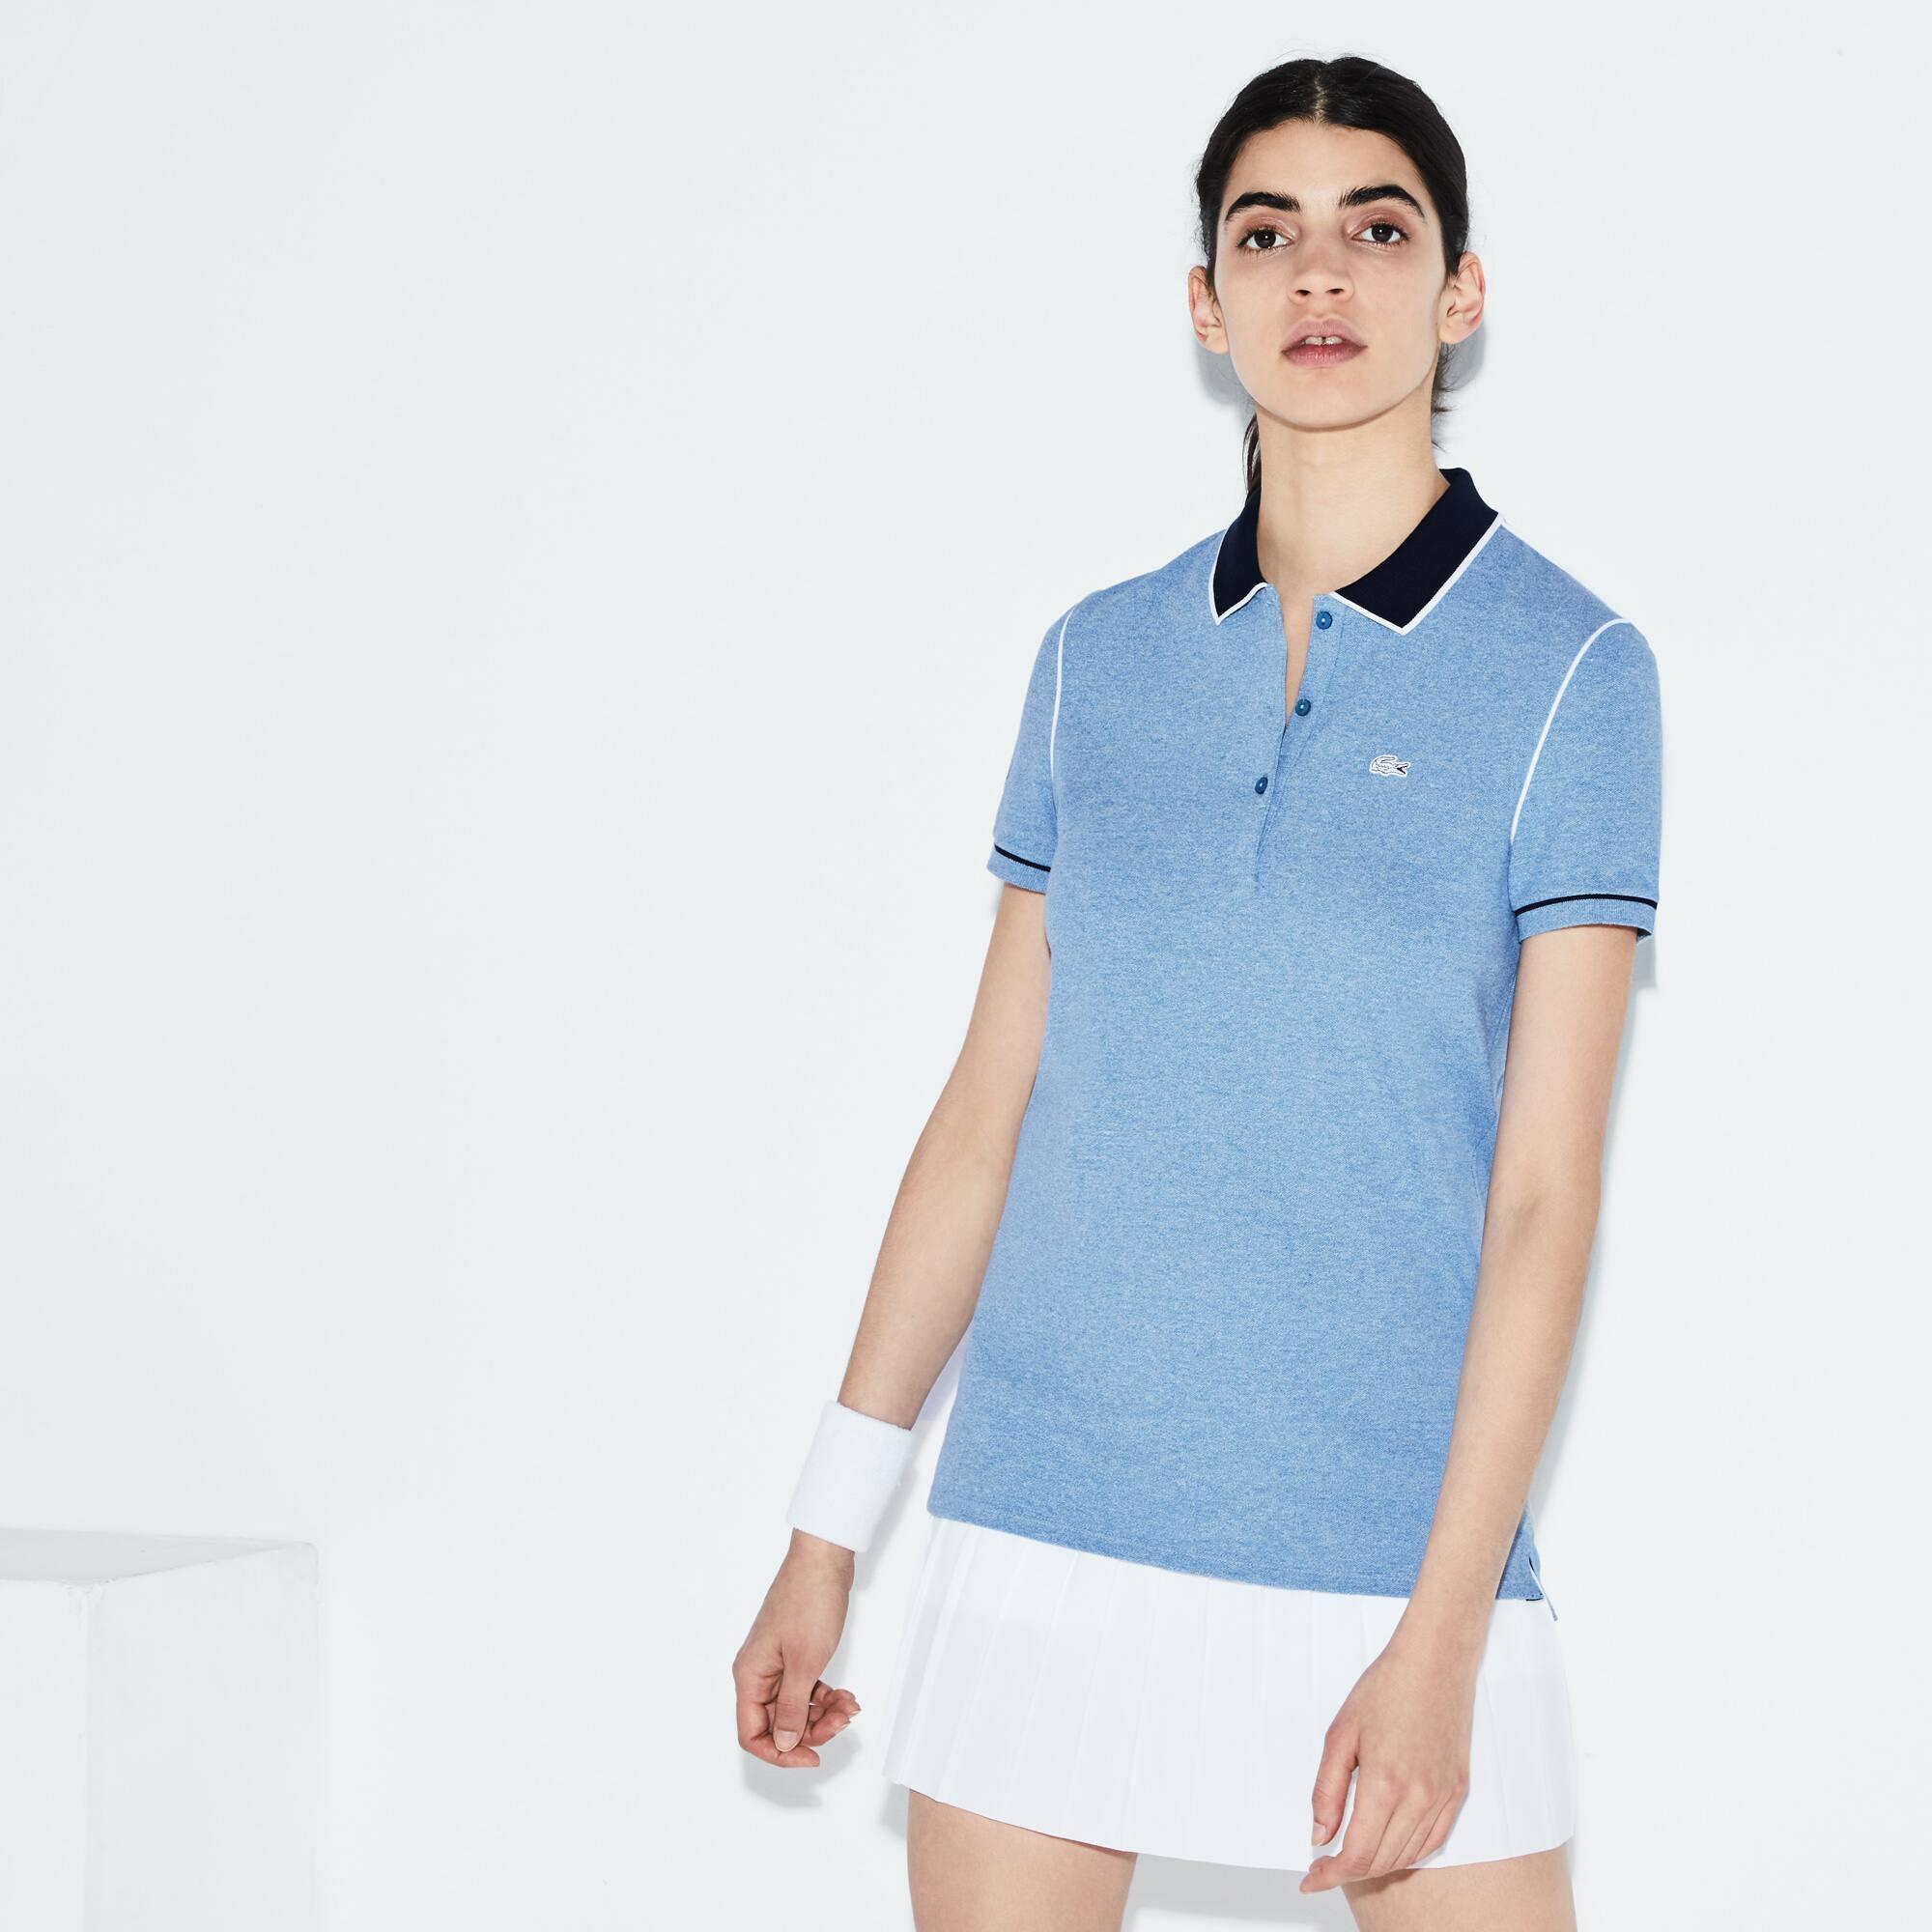 Damen LACOSTE SPORT Roland Garros Edition Stretch-Poloshirt